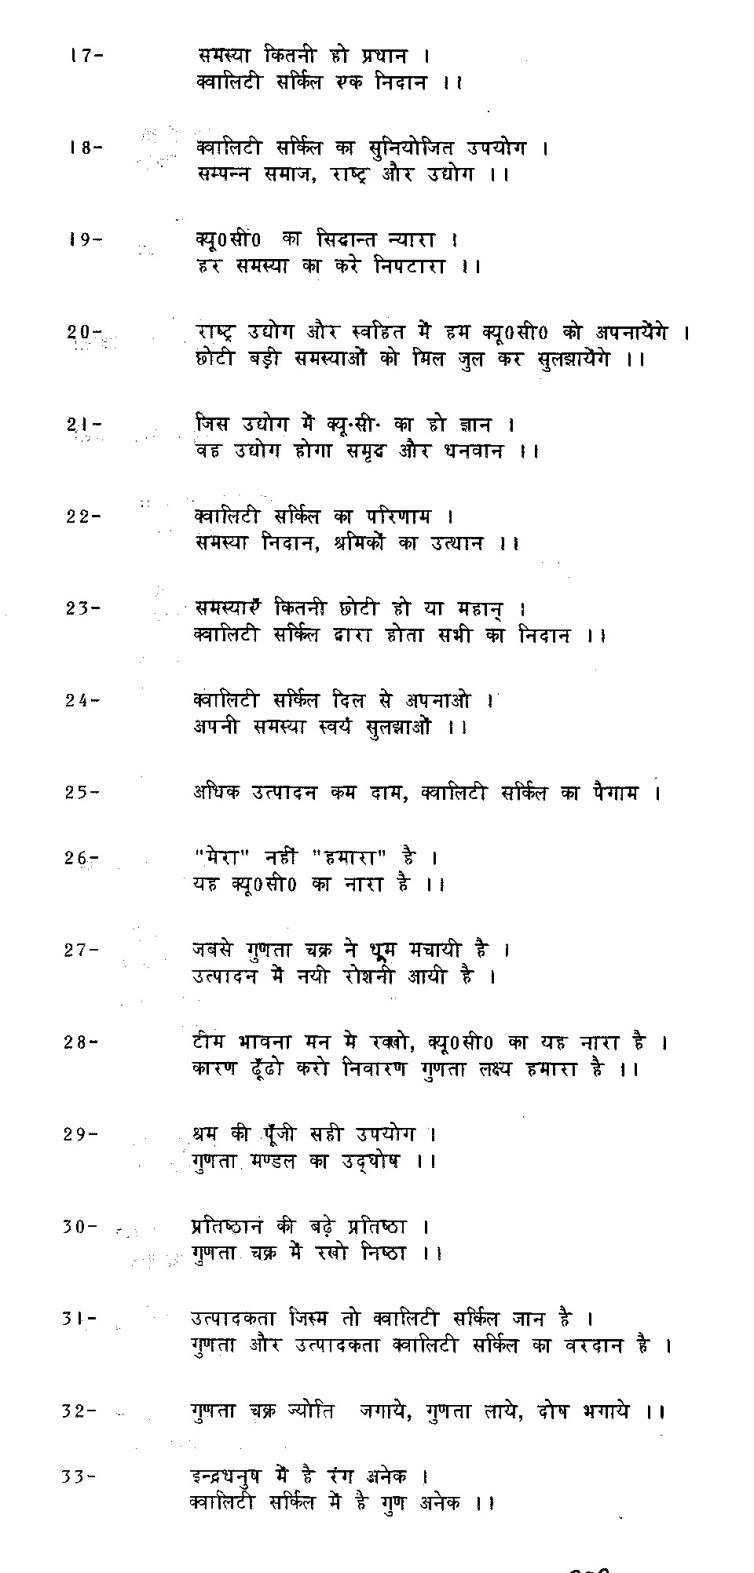 Slogans 17-33